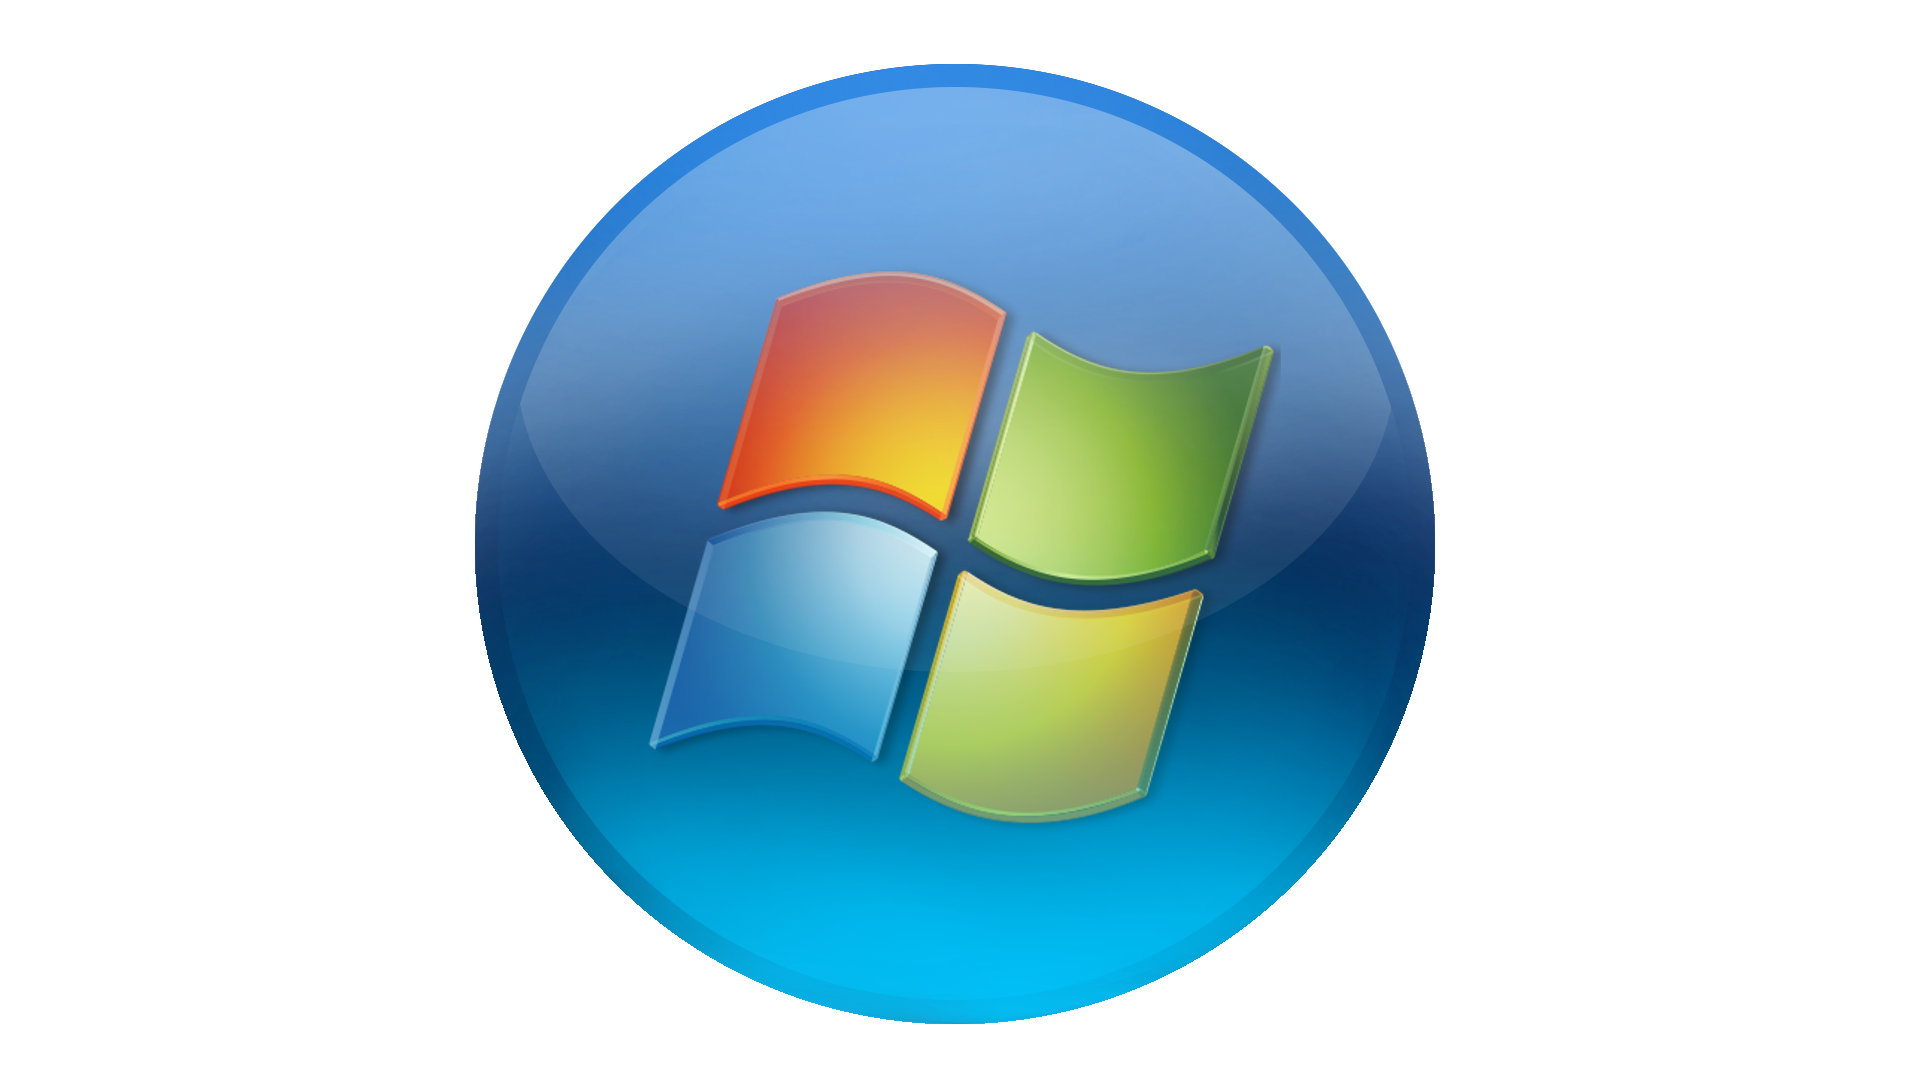 image windowsvista logopng - photo #18